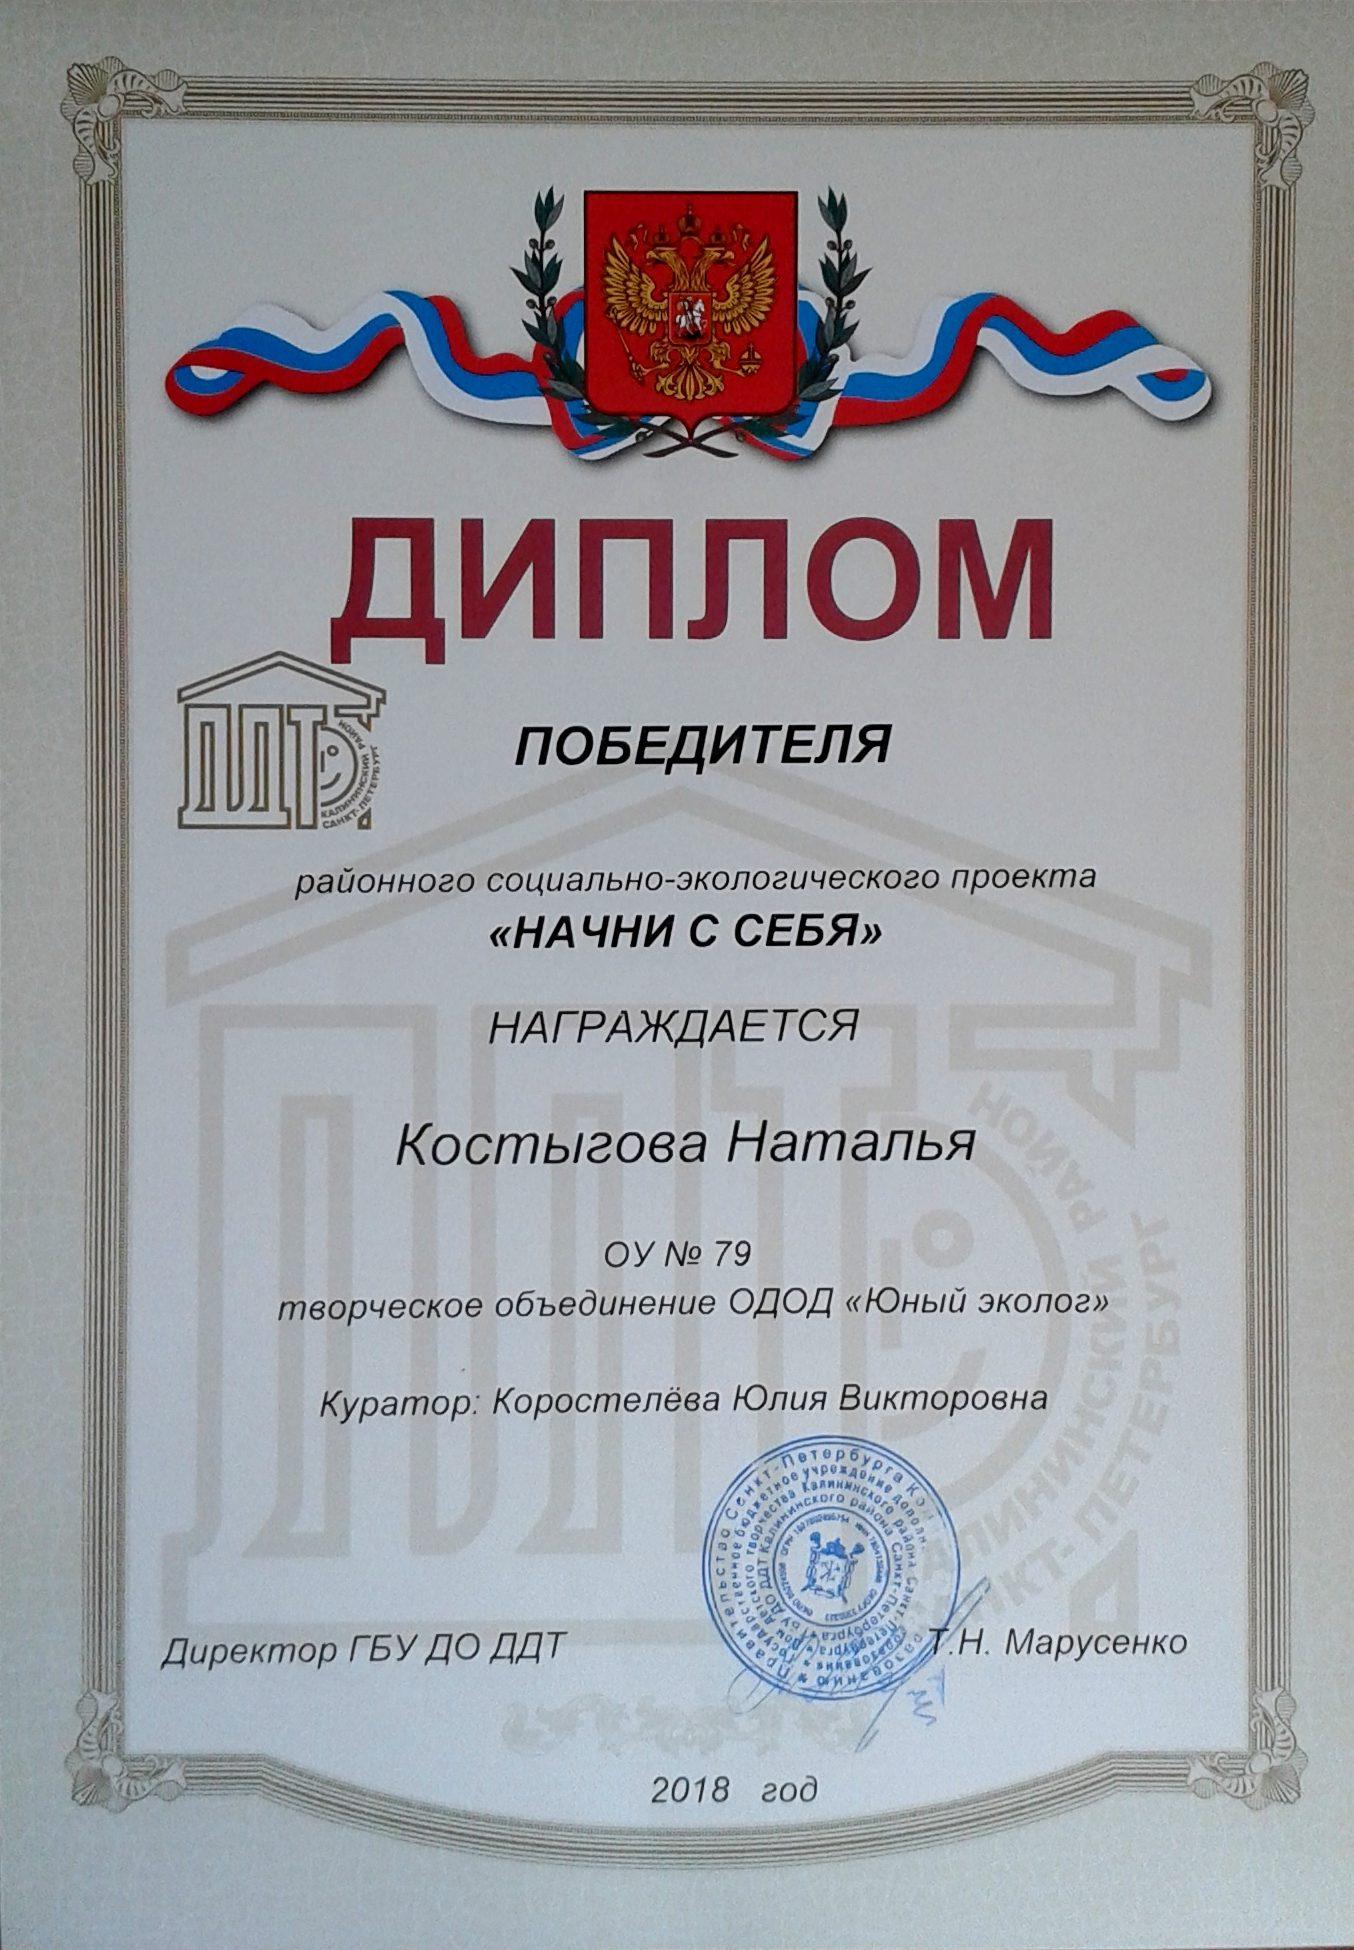 Костыгова Нат